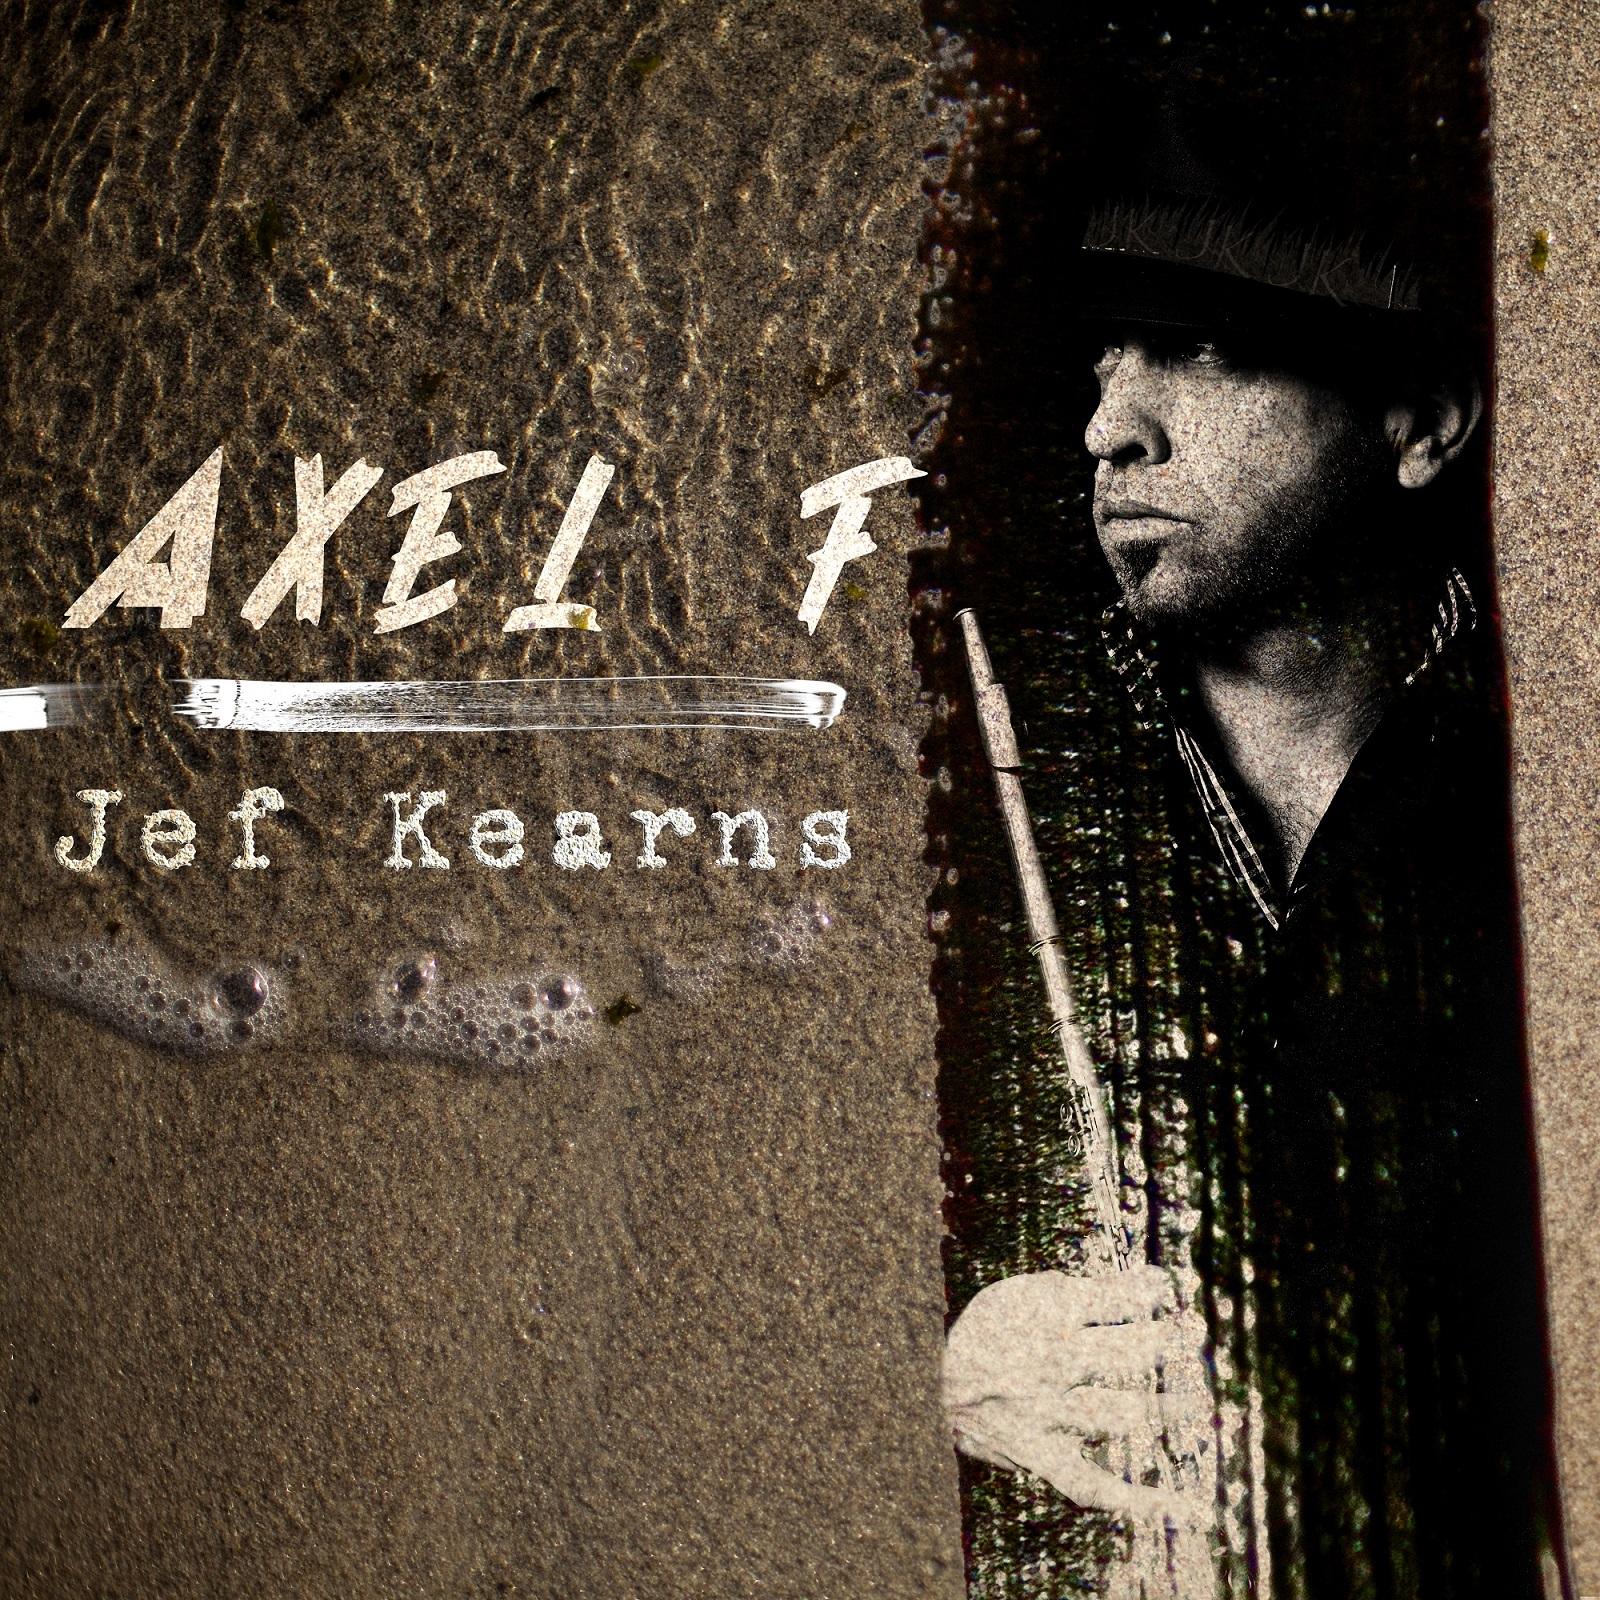 Jef Kearns Axel F.